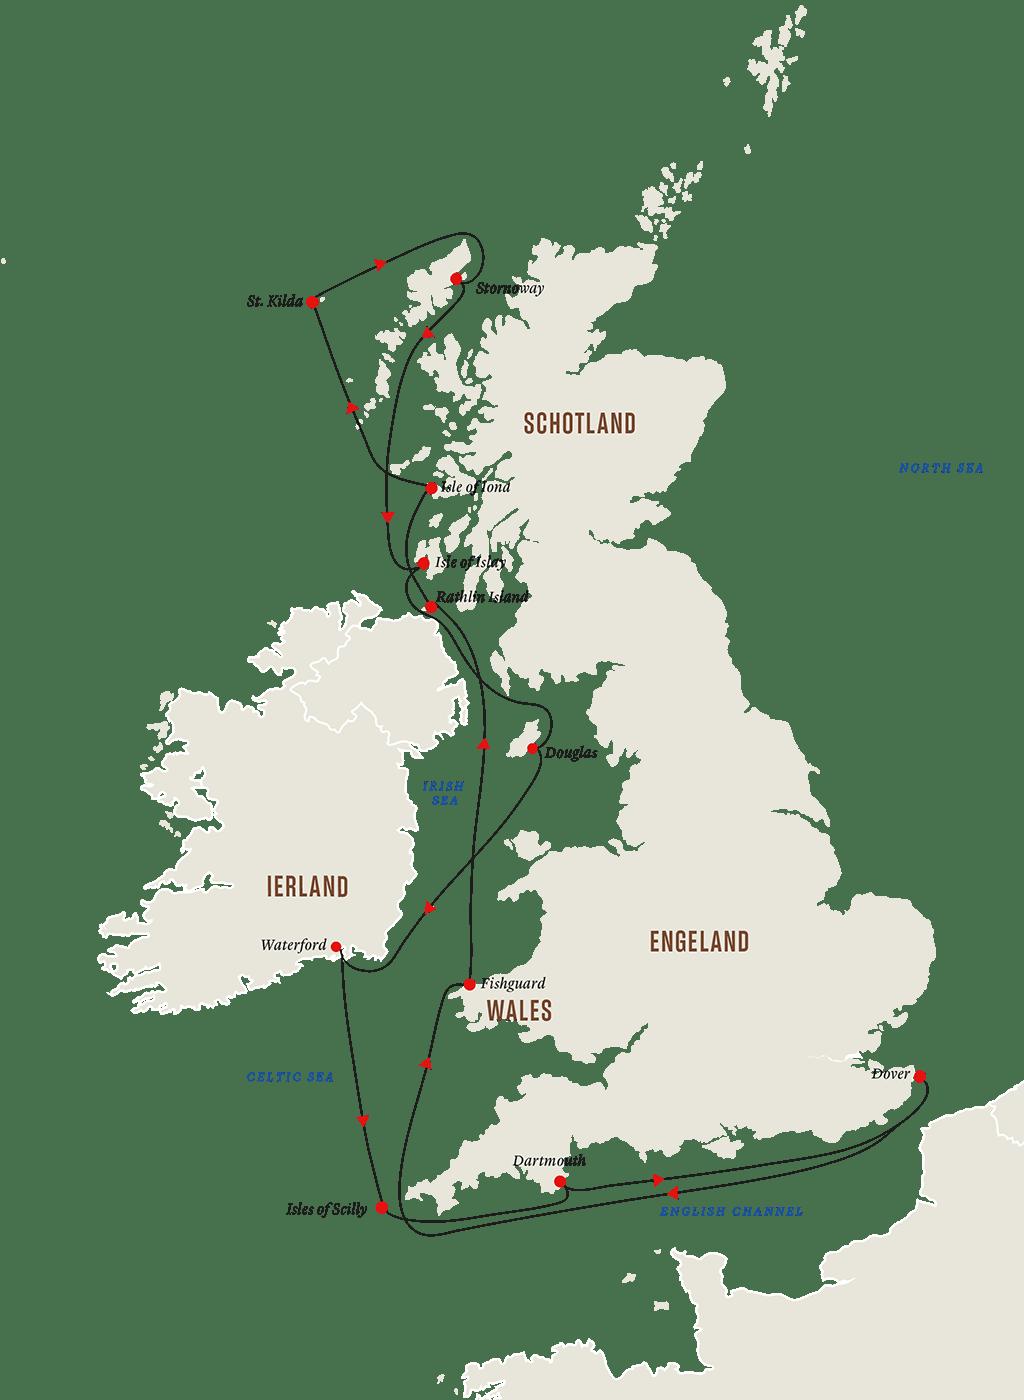 MAGBR2122_Britse-eilanden-Afgelegen-eilanden-afwisselende-kustlijn-1.png